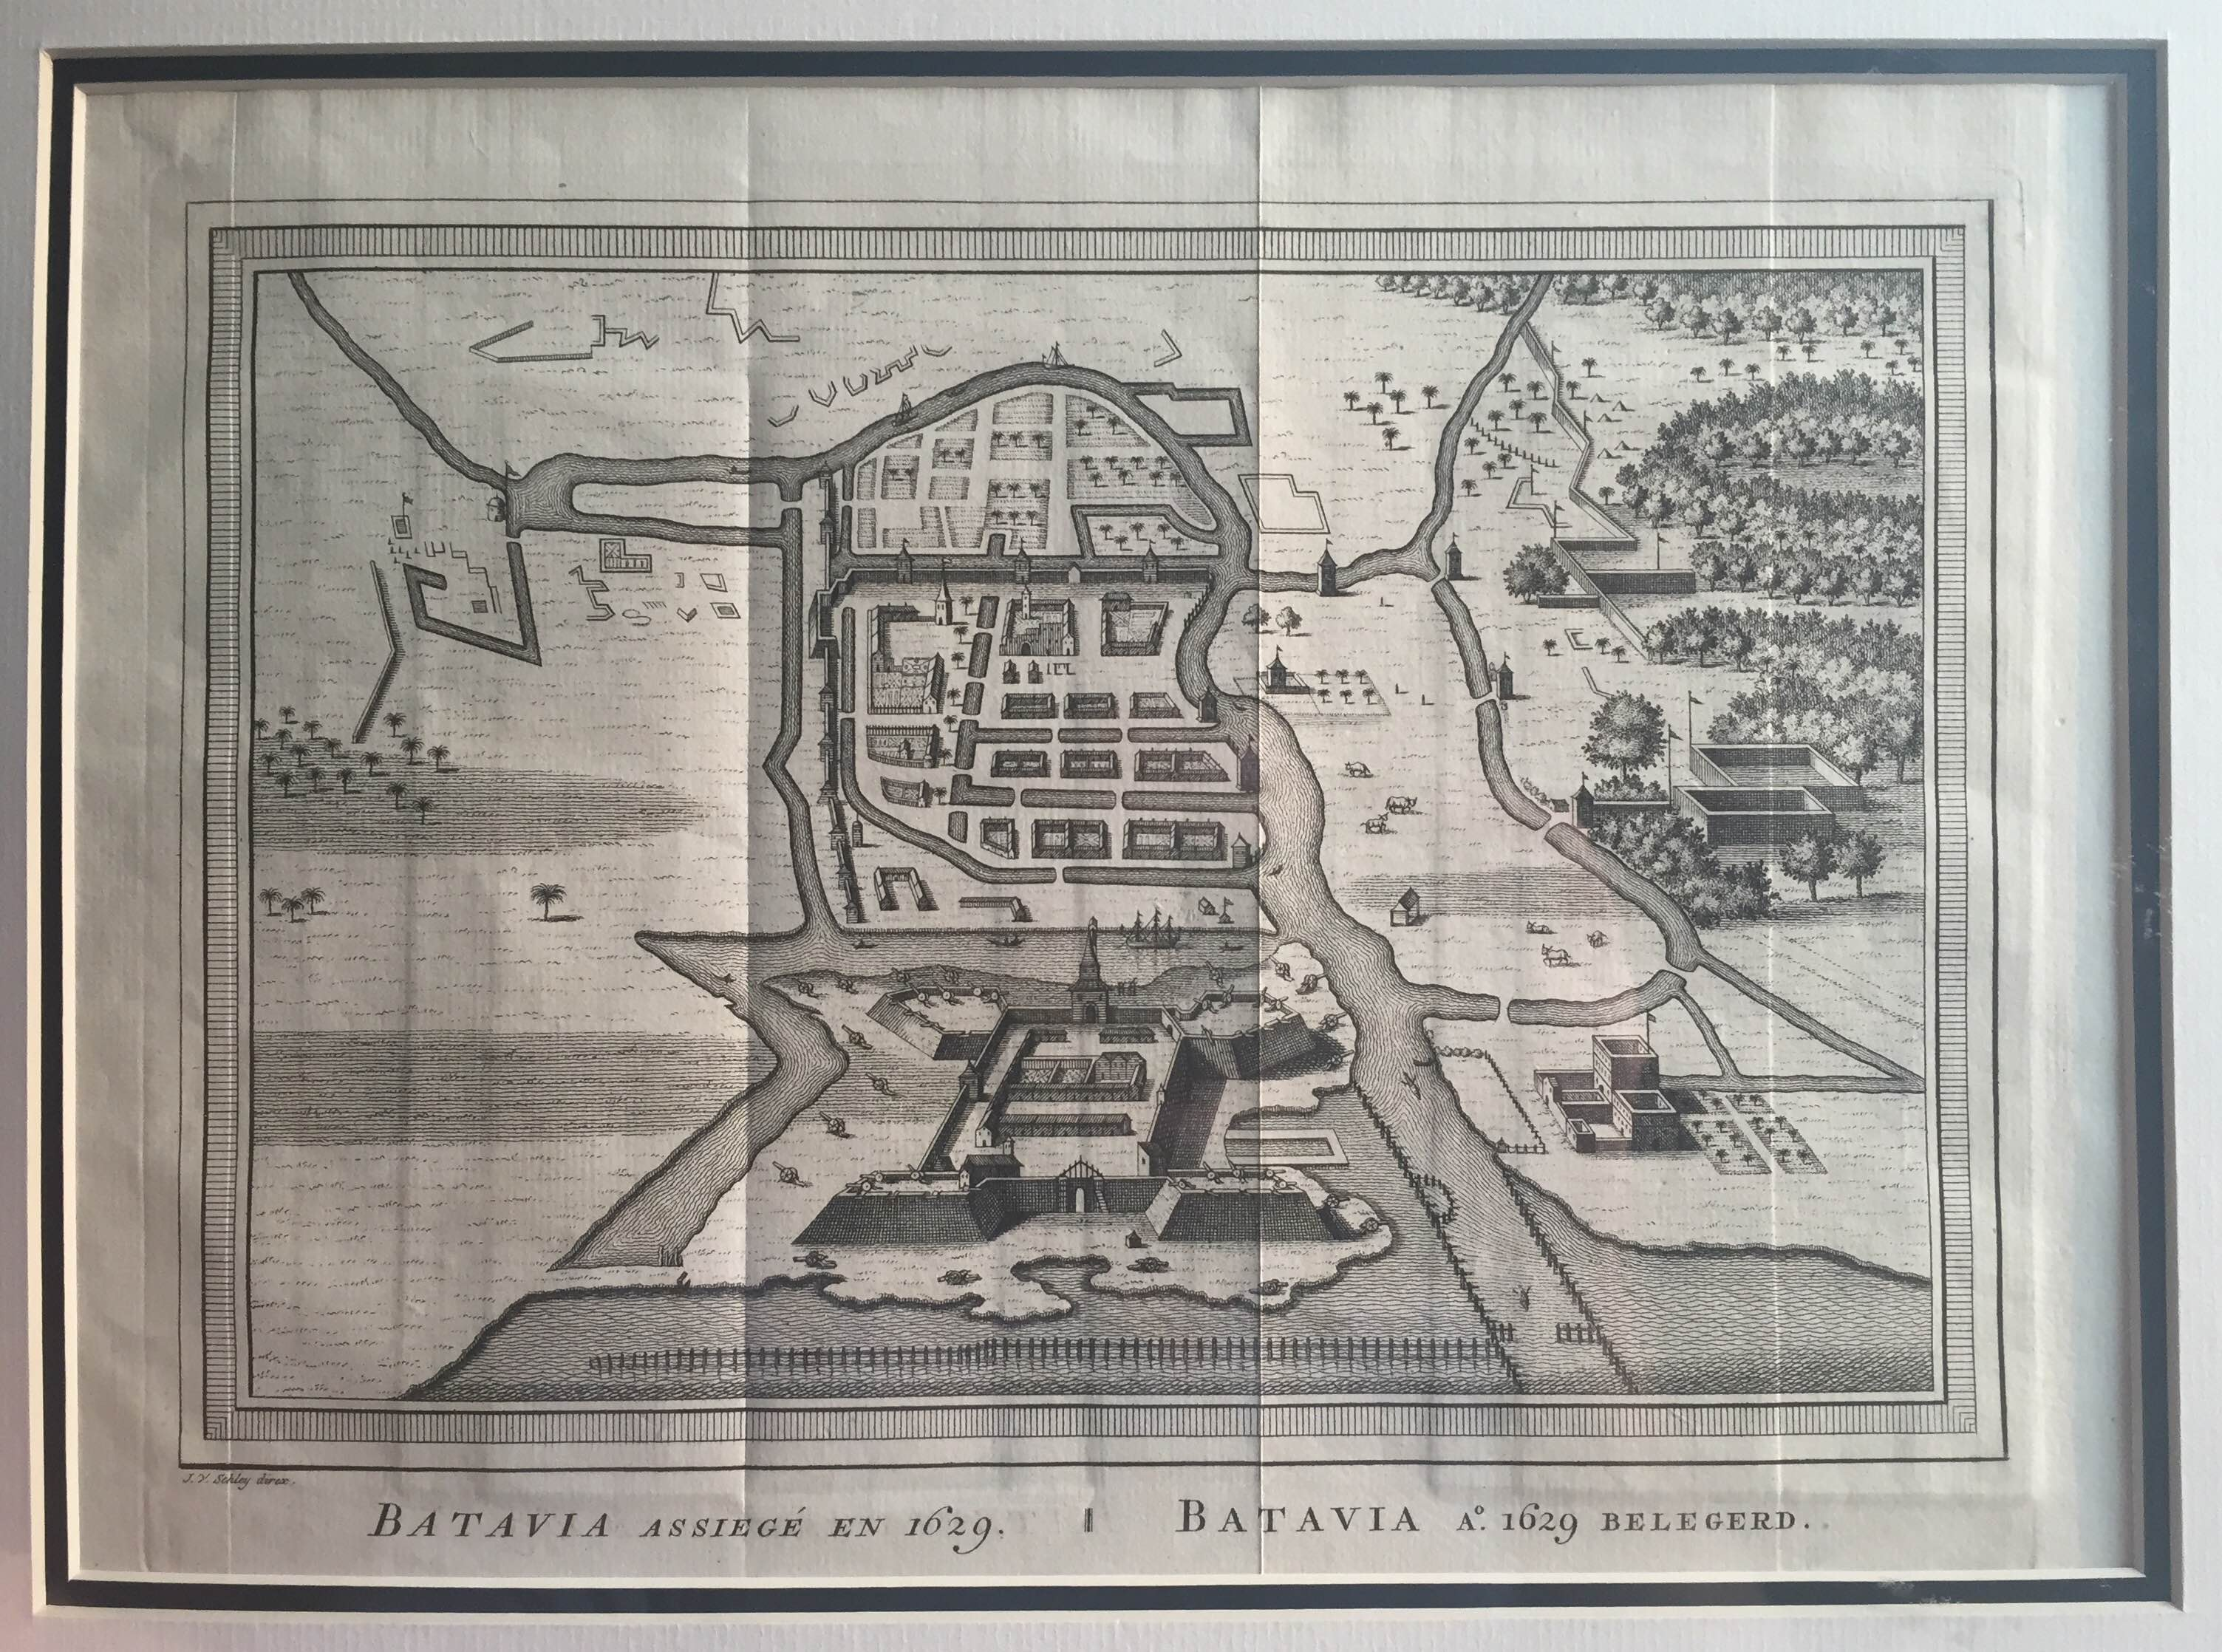 Antique Map Batavia by Van Sch...